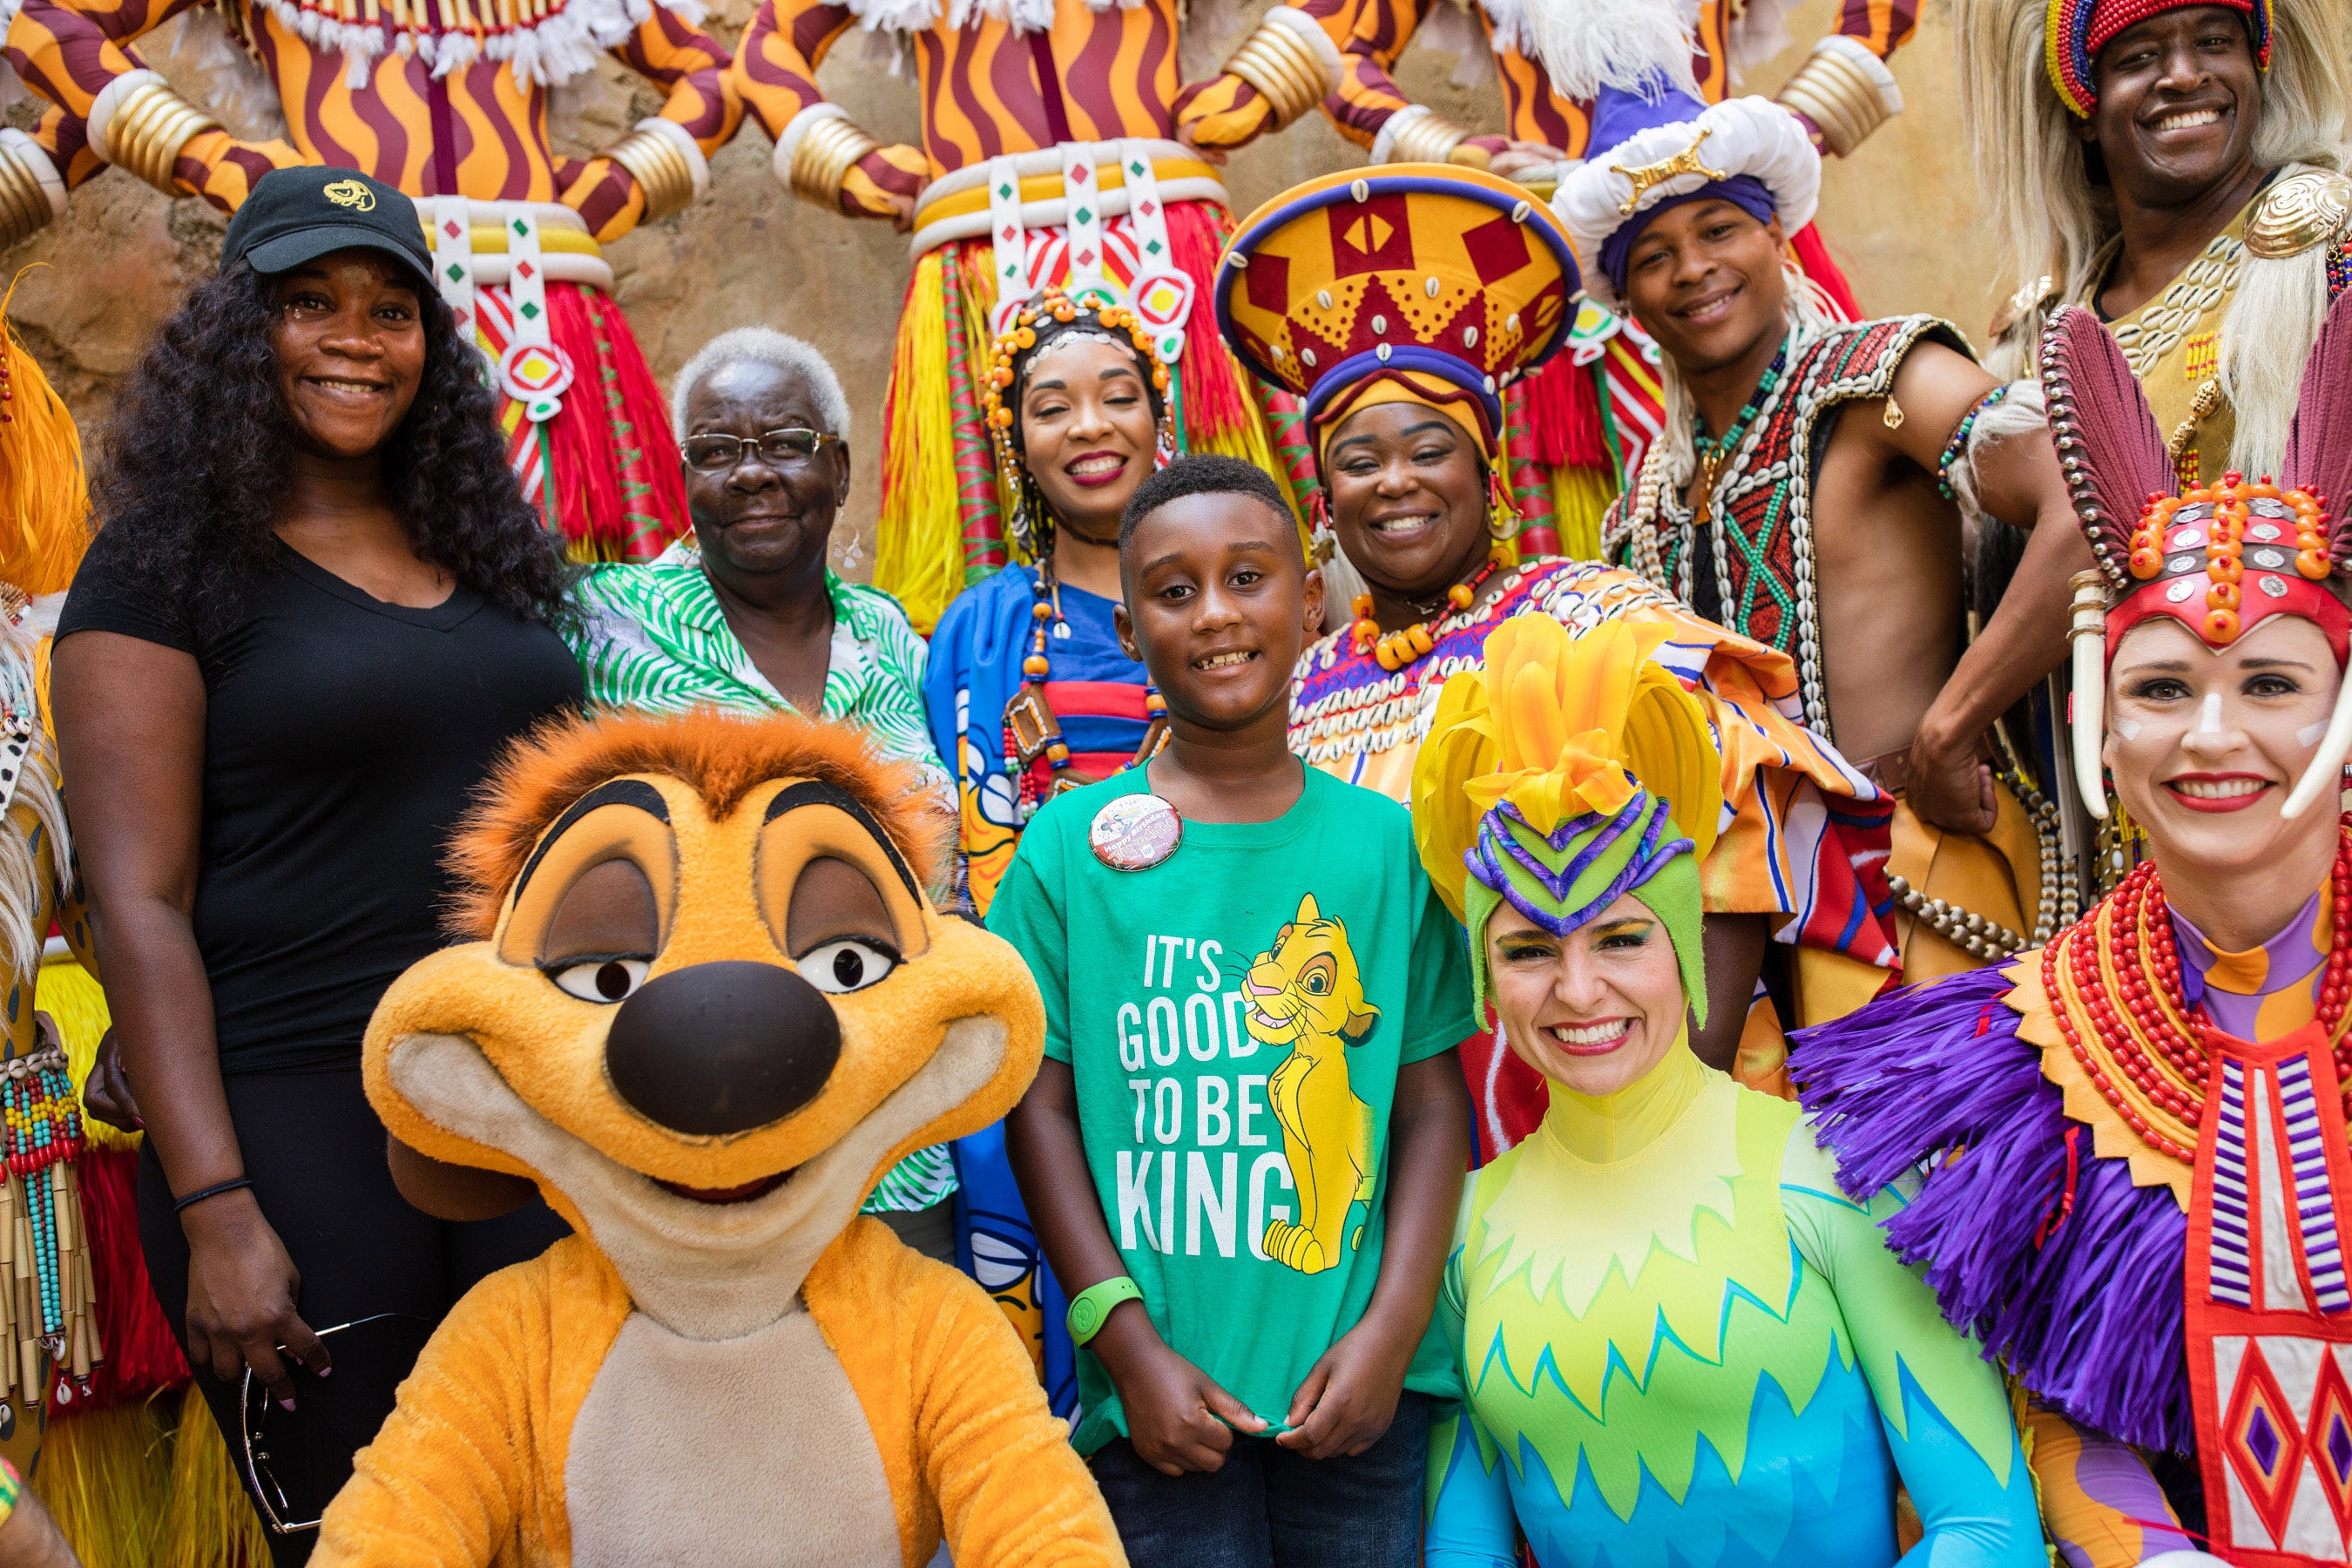 Boy who spent Disney money to help Hurricane Dorian evacuees gets free Disney World trip